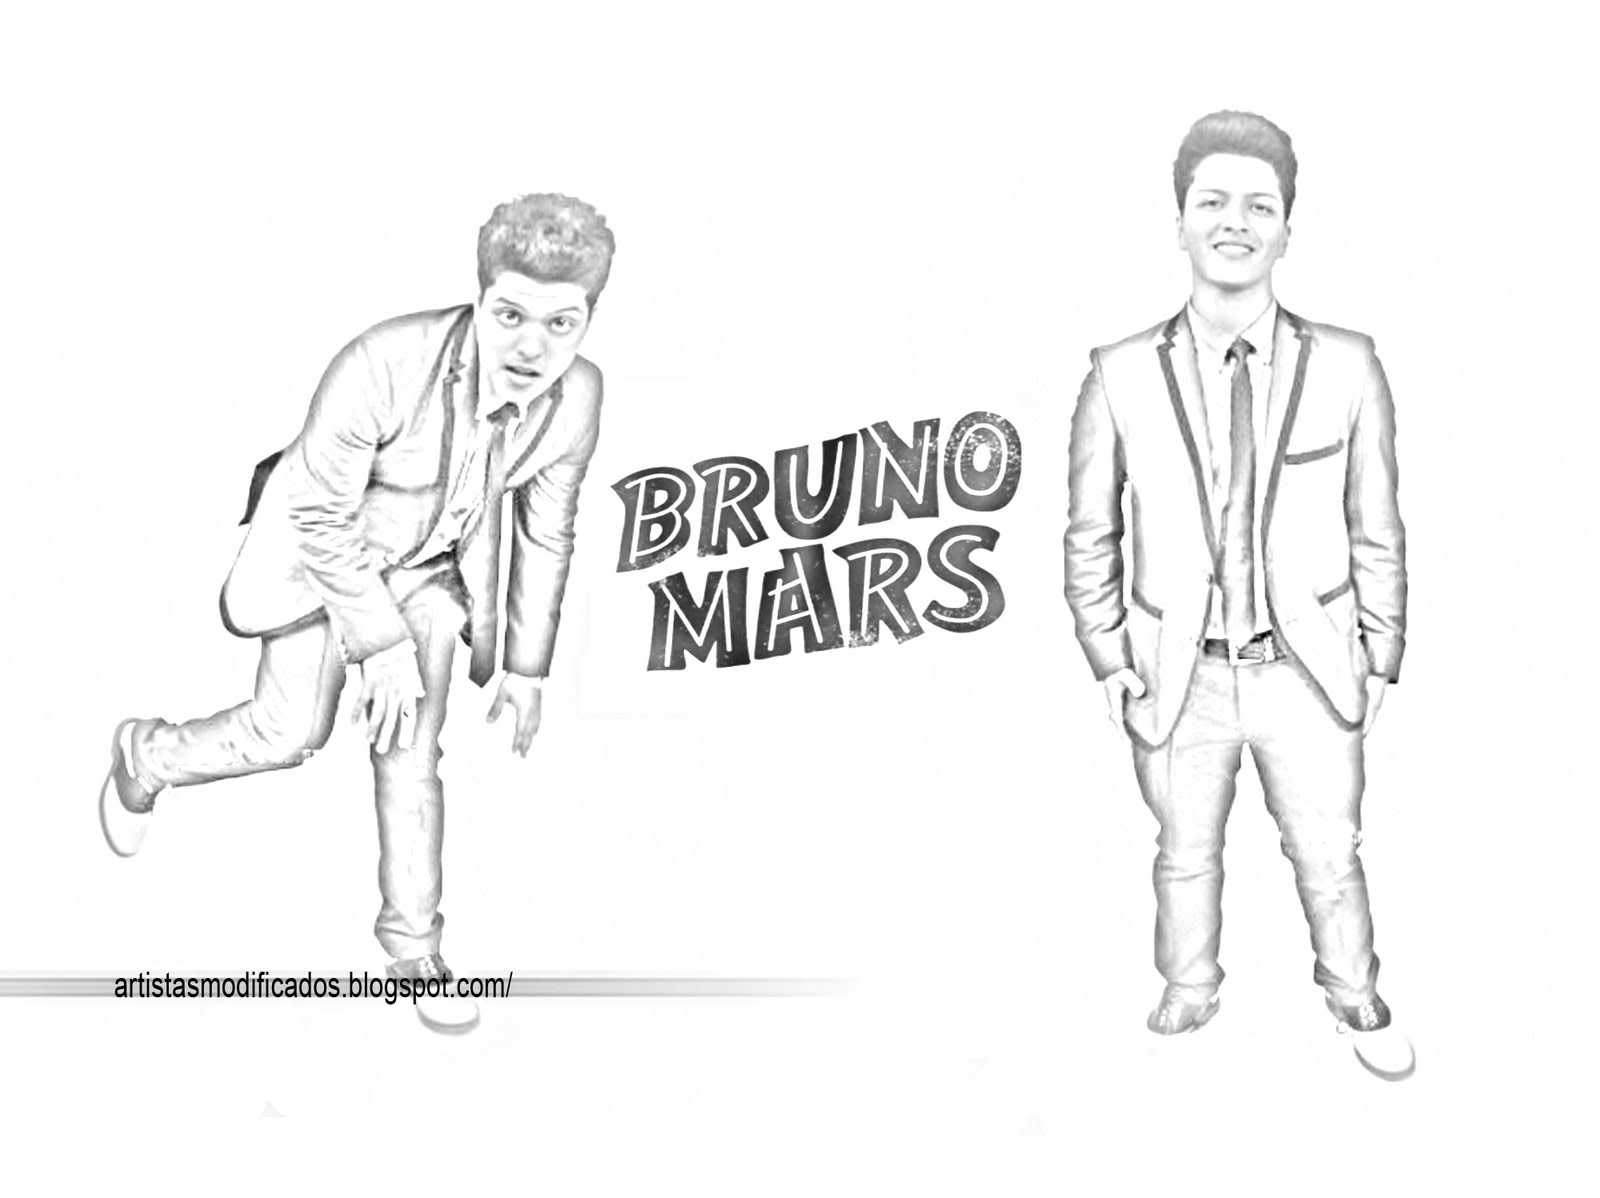 bruno mars coloring pages | Bruno Mars Coloring Pages Coloring Pages